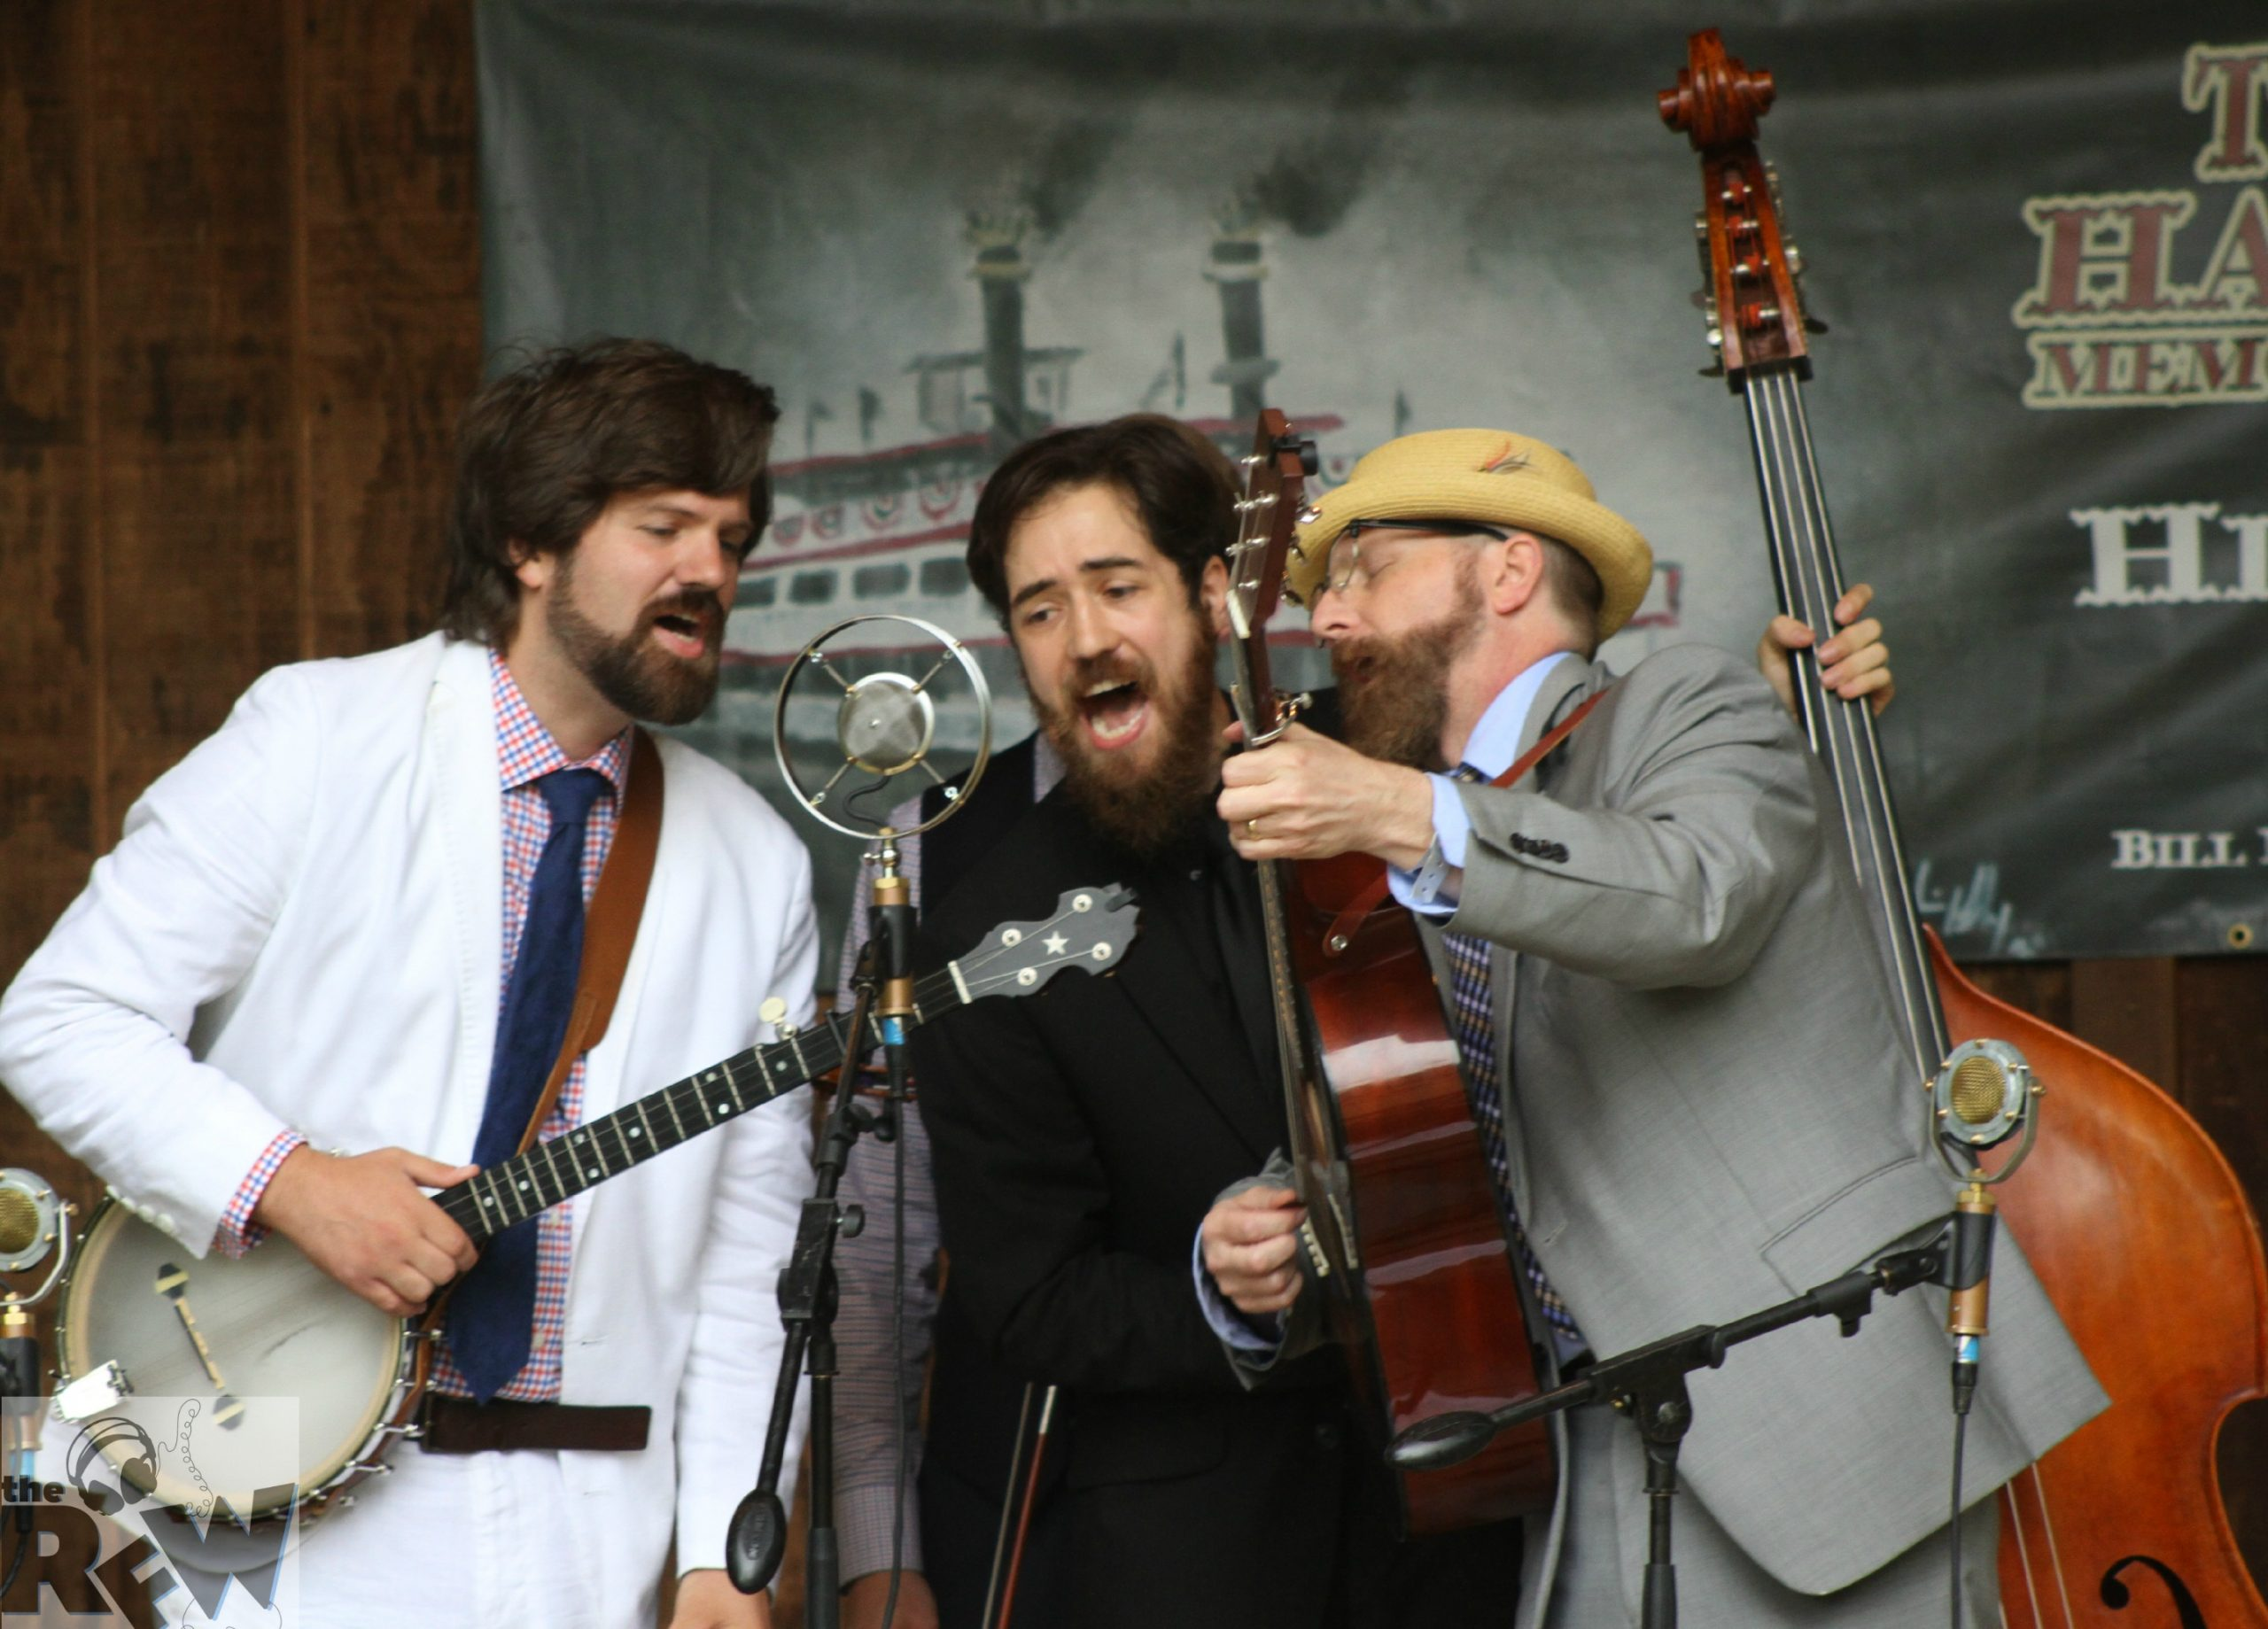 The John Hartford Memorial Festival Review